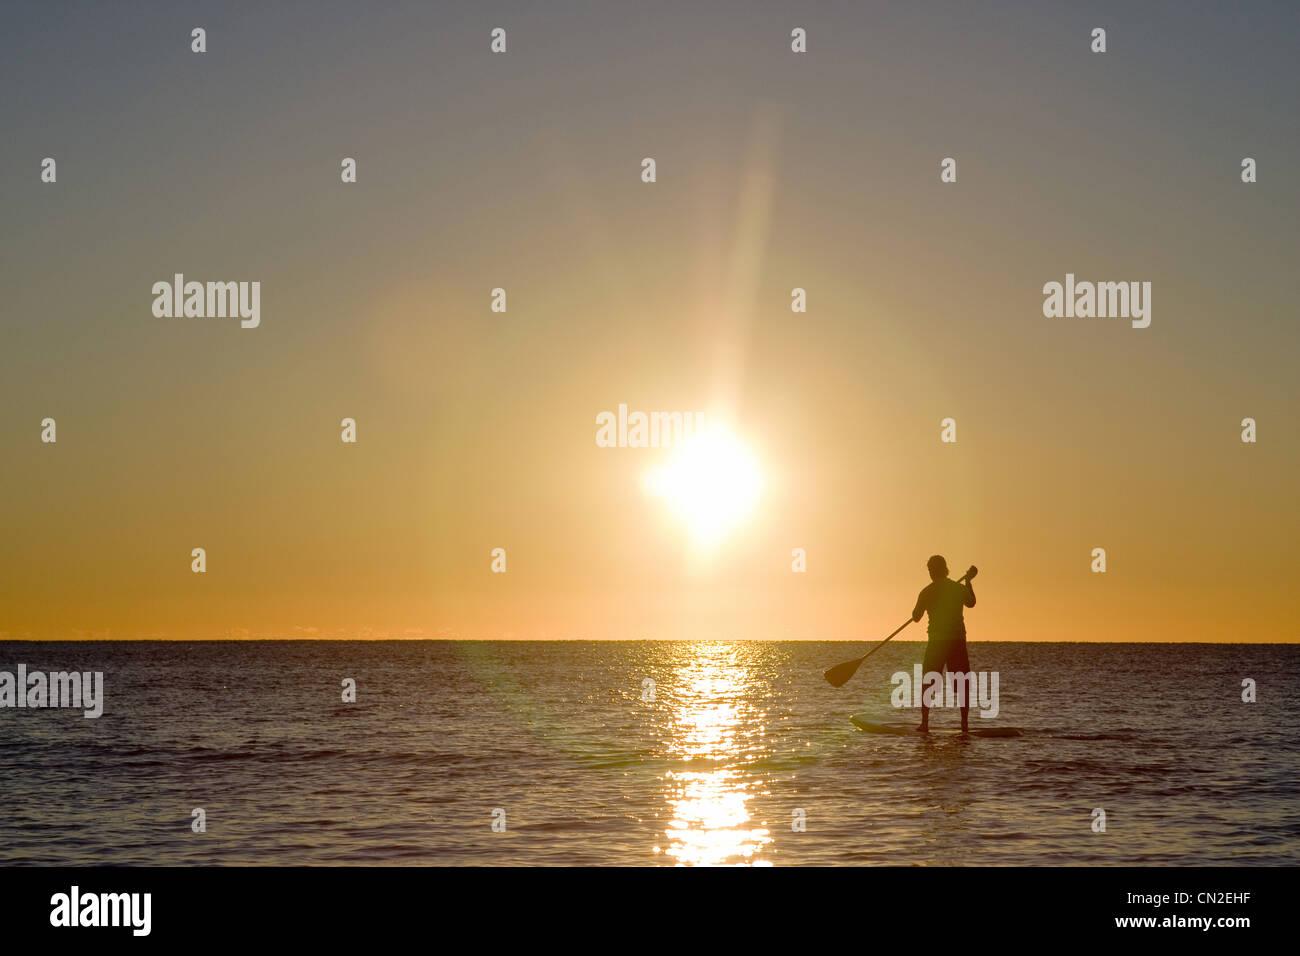 L'uomo Paddleboarding presso Sunrise, Florida Keys, STATI UNITI D'AMERICA Immagini Stock